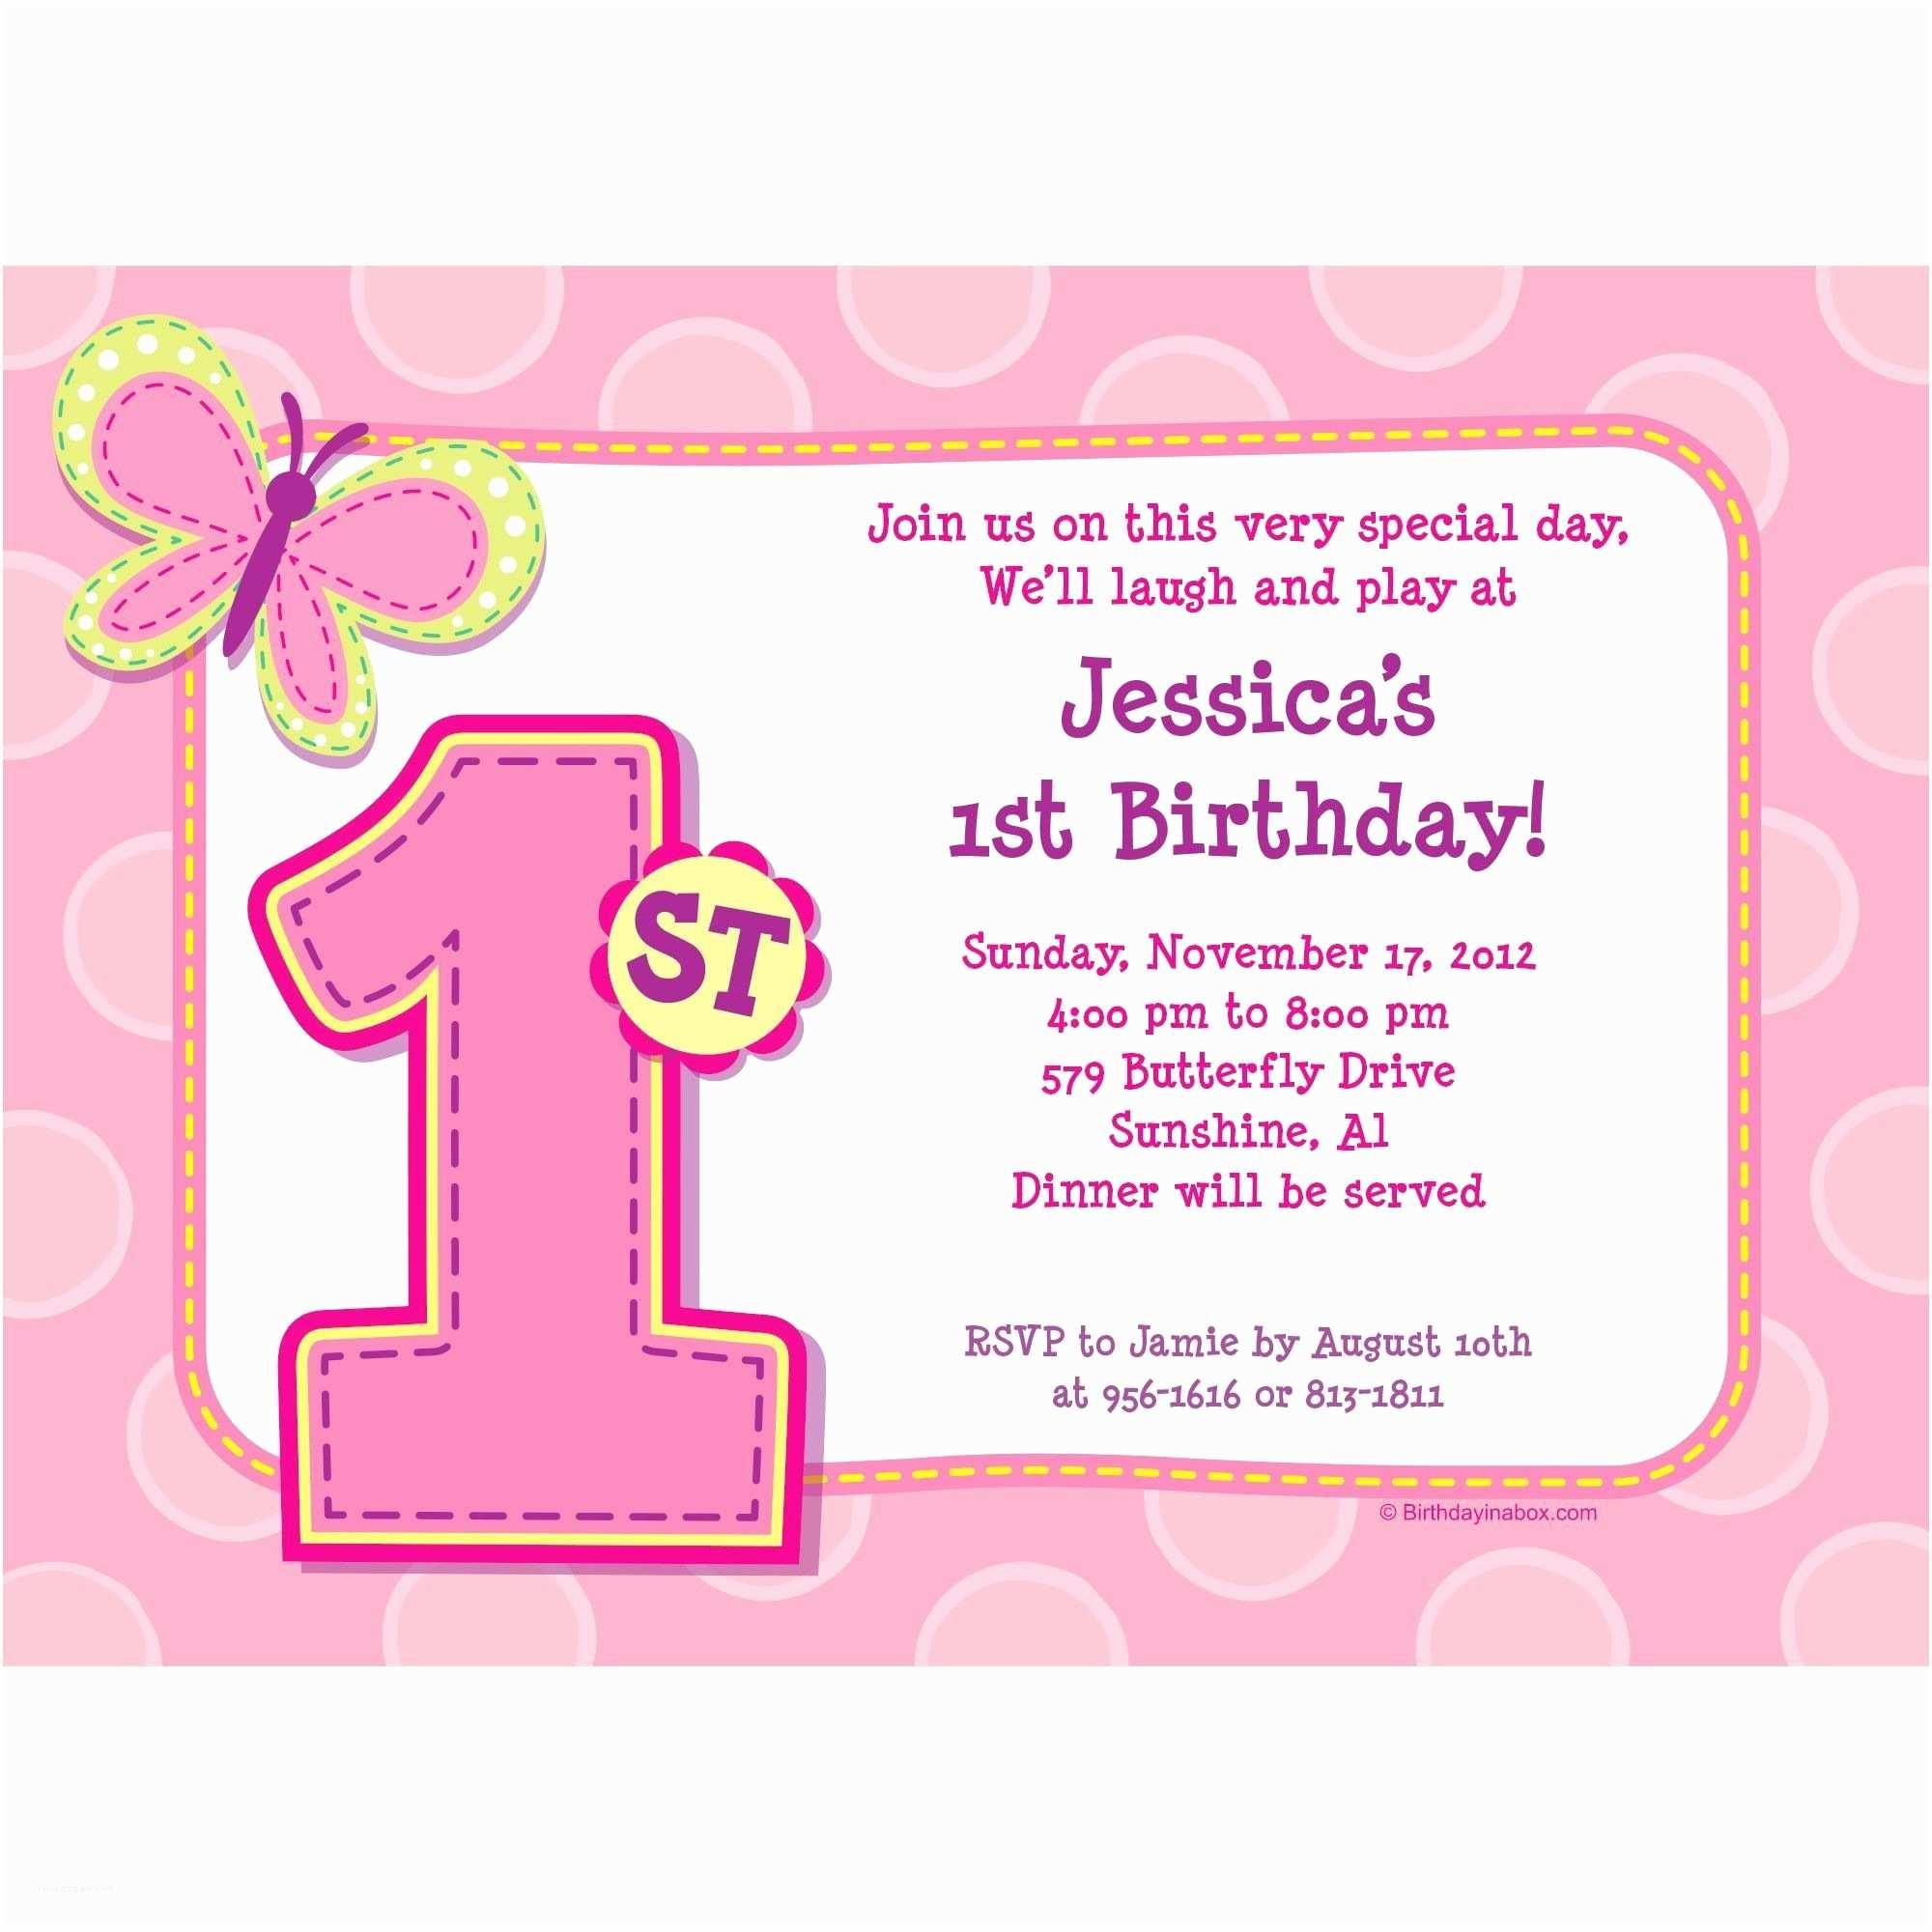 First Birthday Invitations Girl 1st Birthday Girl Personalized Invitation Each Bargain